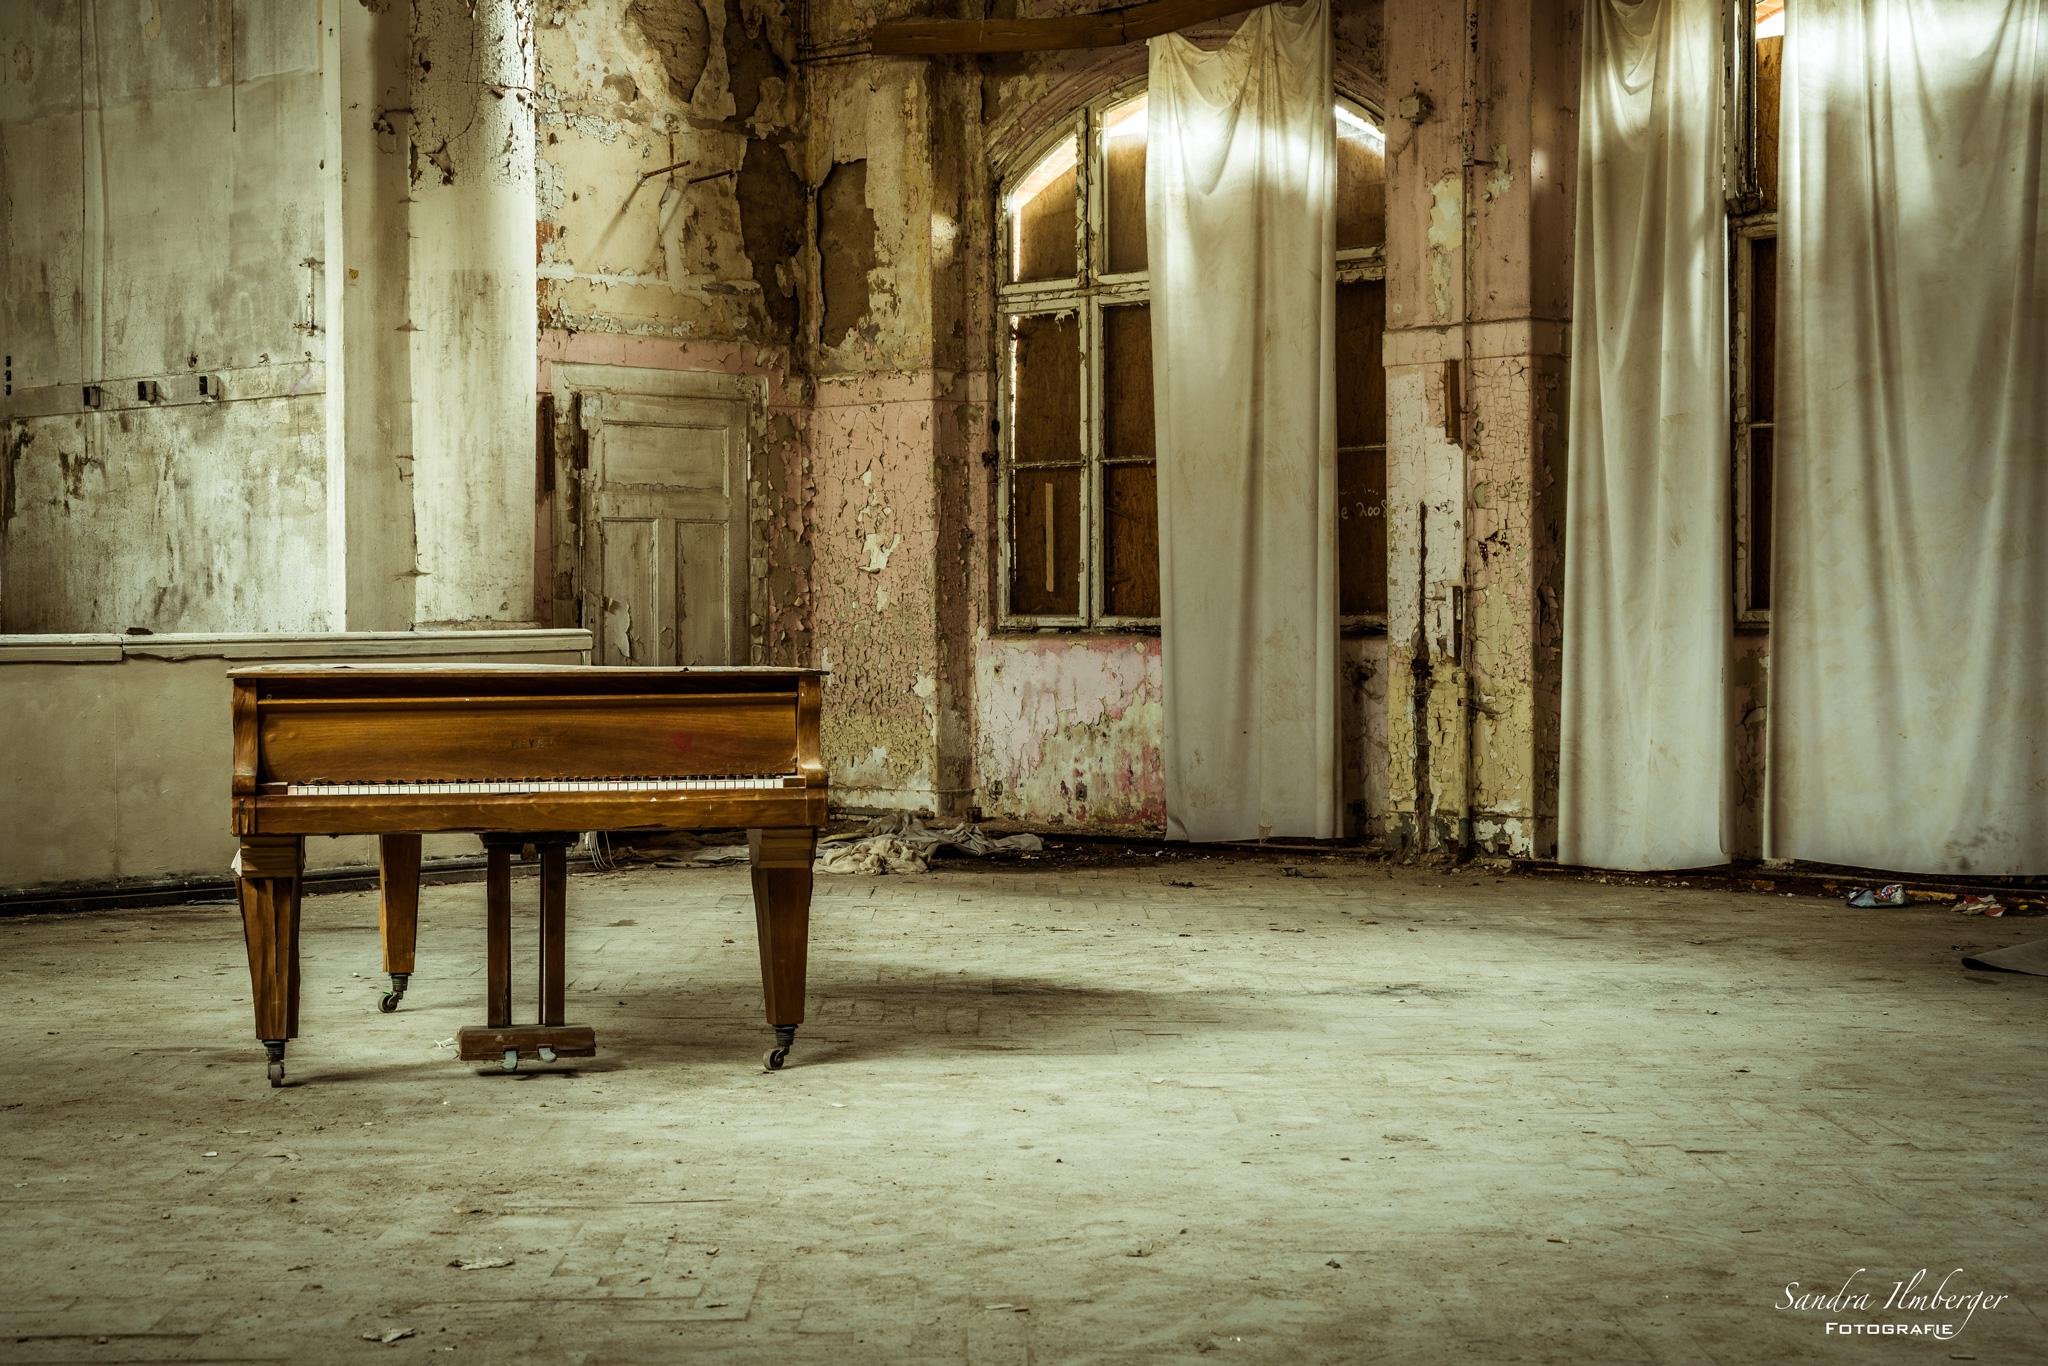 Piano Piano (Foto: Sandra Ilmberger)